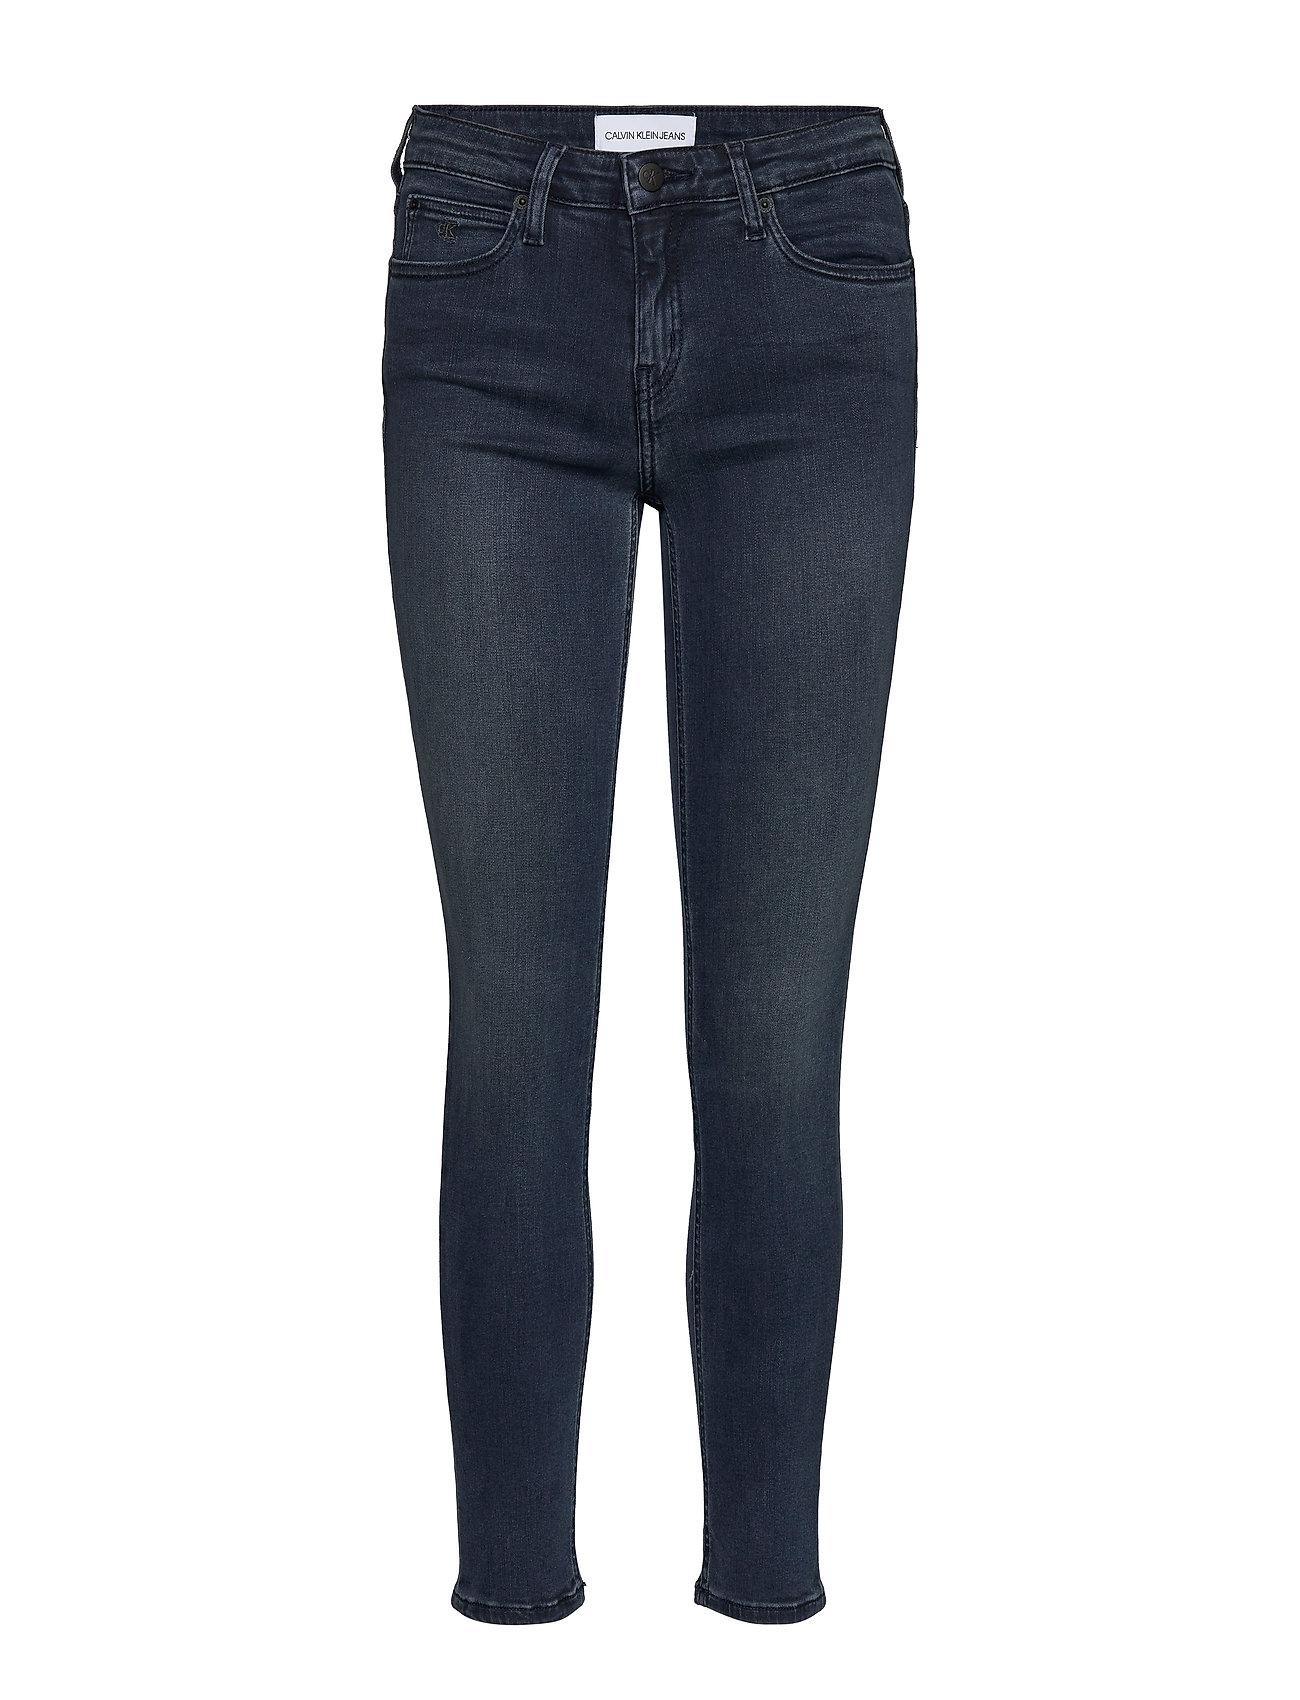 Calvin Klein Jeans CKJ 011 MID RISE SKINNY - CA033 BLUE BLACK